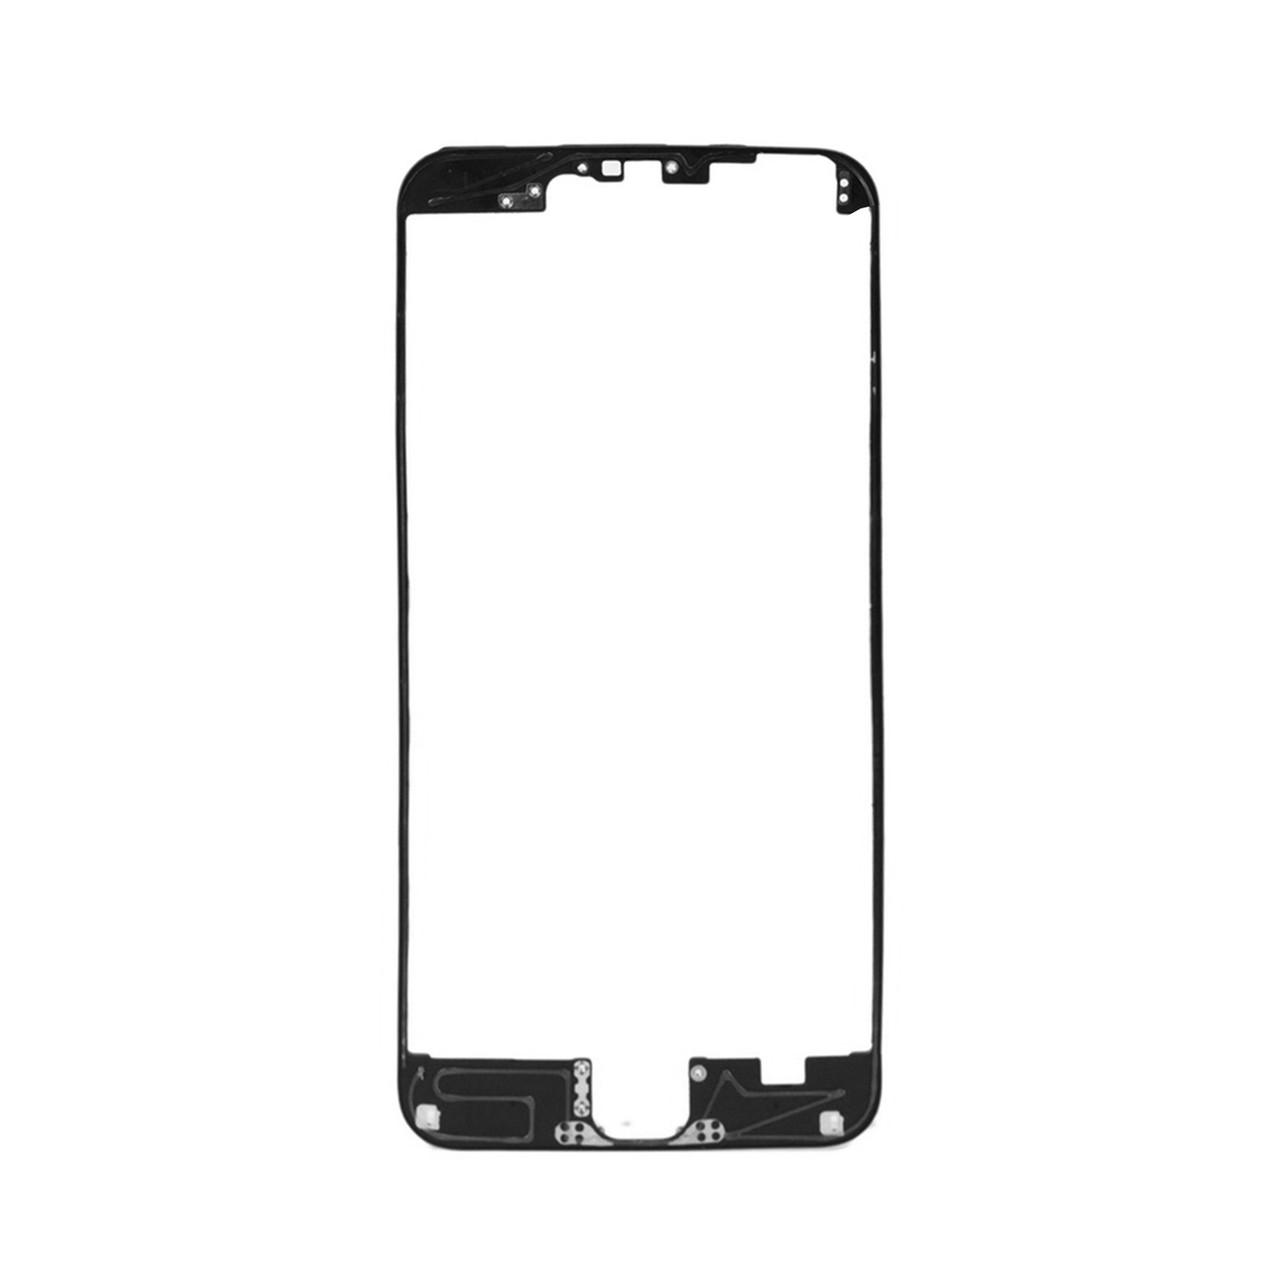 Рамка для дисплея Apple iPhone 6G Plus AAA внутренняя пустая Black (10)